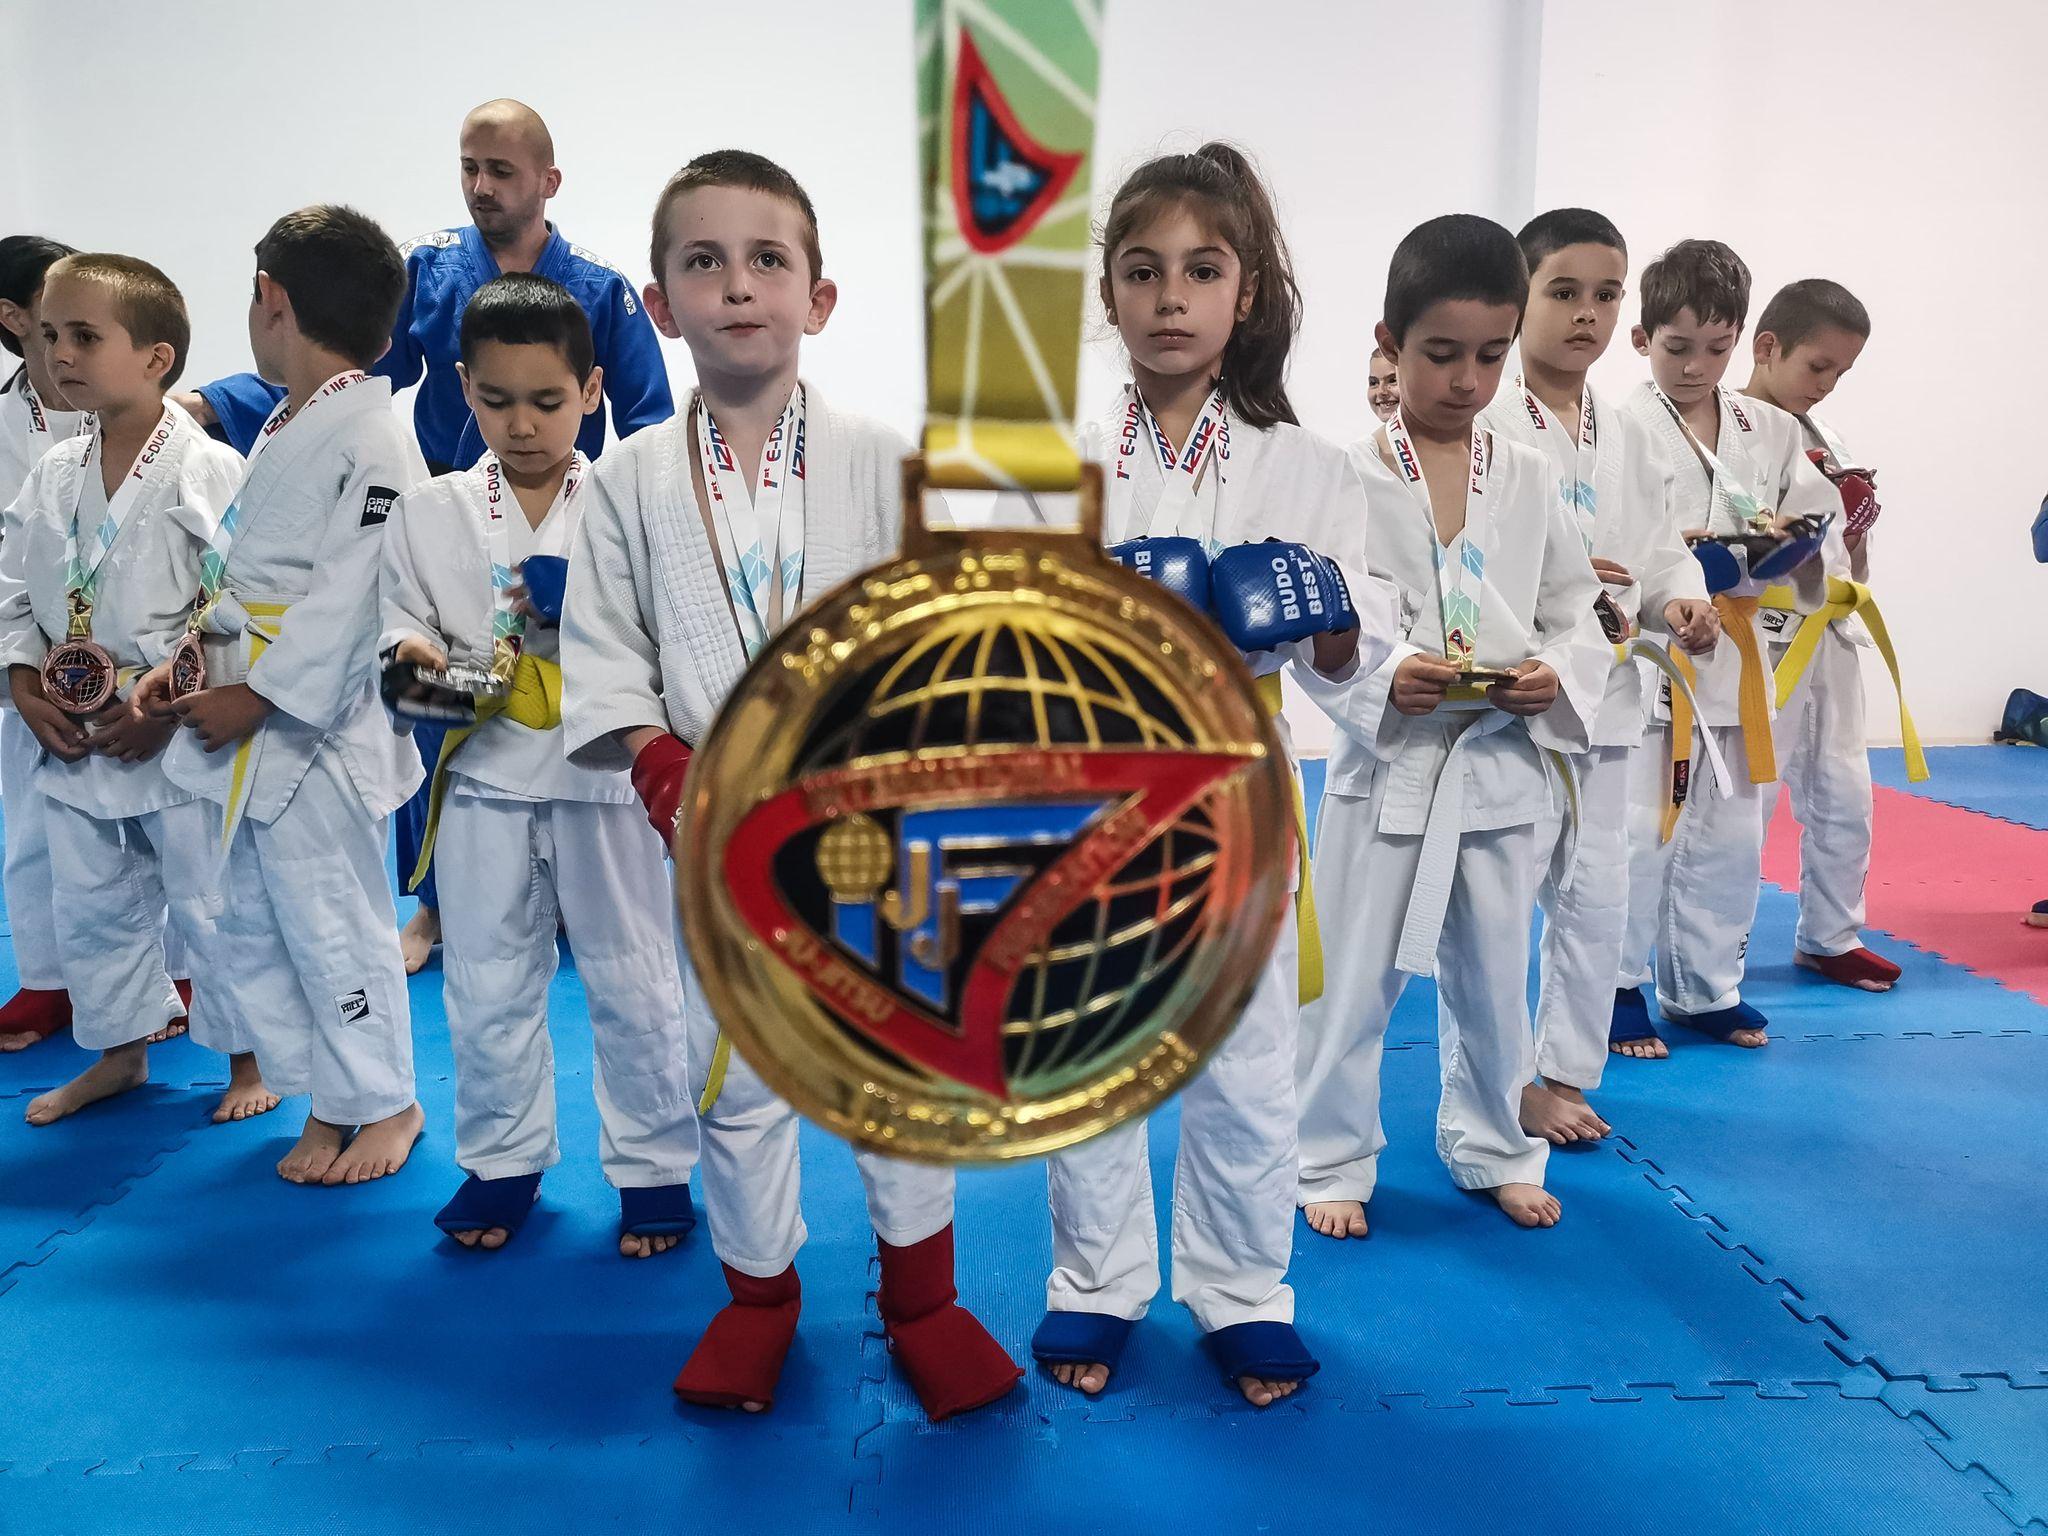 2021 – Ju-Jitsu eTournament Duo System – the medallists